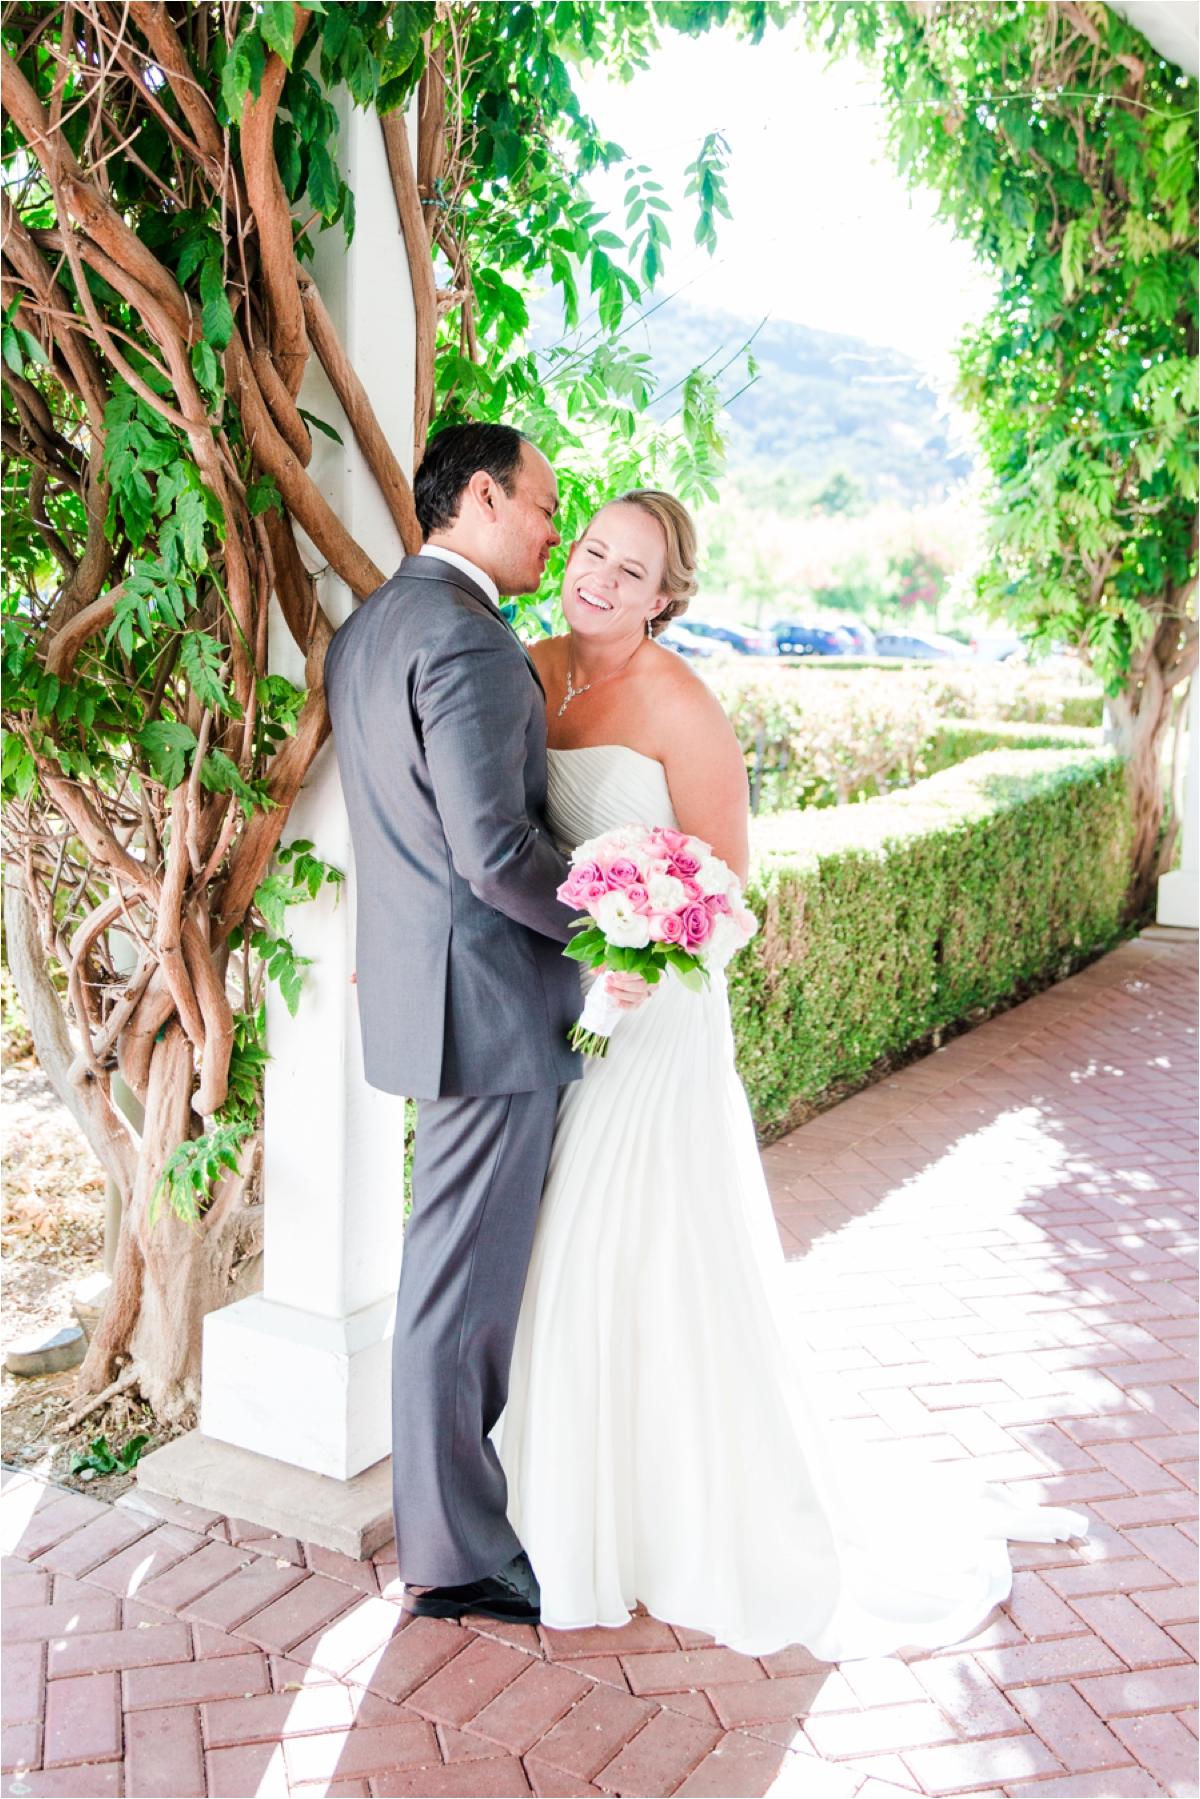 Eagle Ridge Golf Club wedding pictures by Briana Calderon Photography_0415.jpg